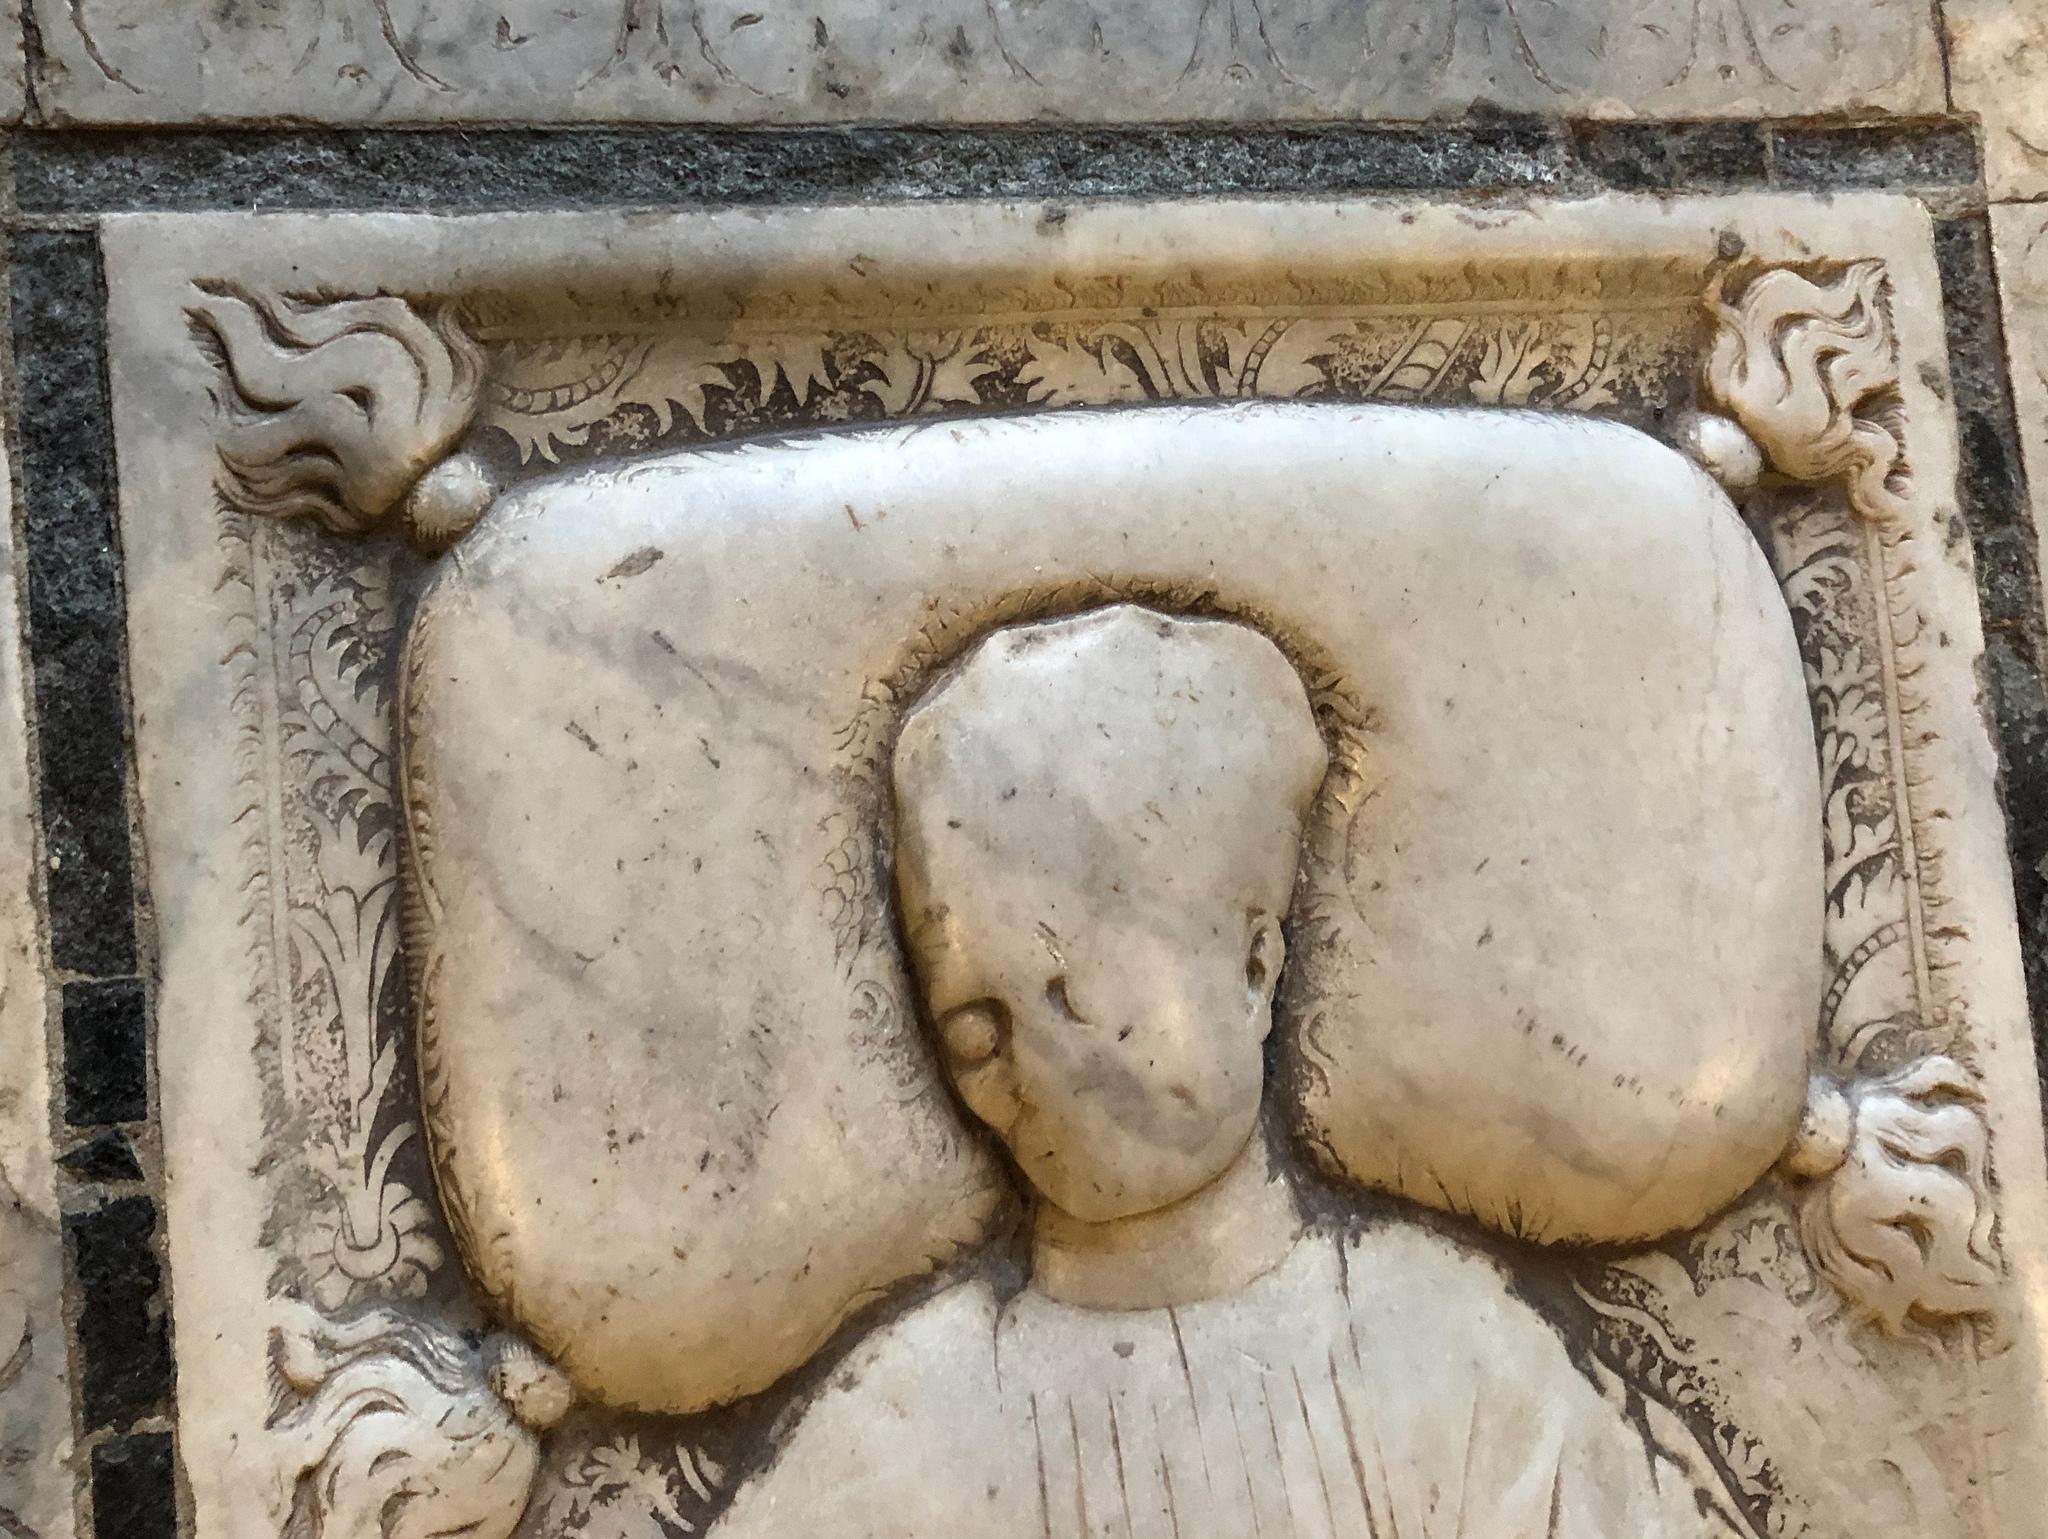 Tomb of Agostino Sanctucio. Late 15th century. Basilica of Santa Croce. Florence, Italy.